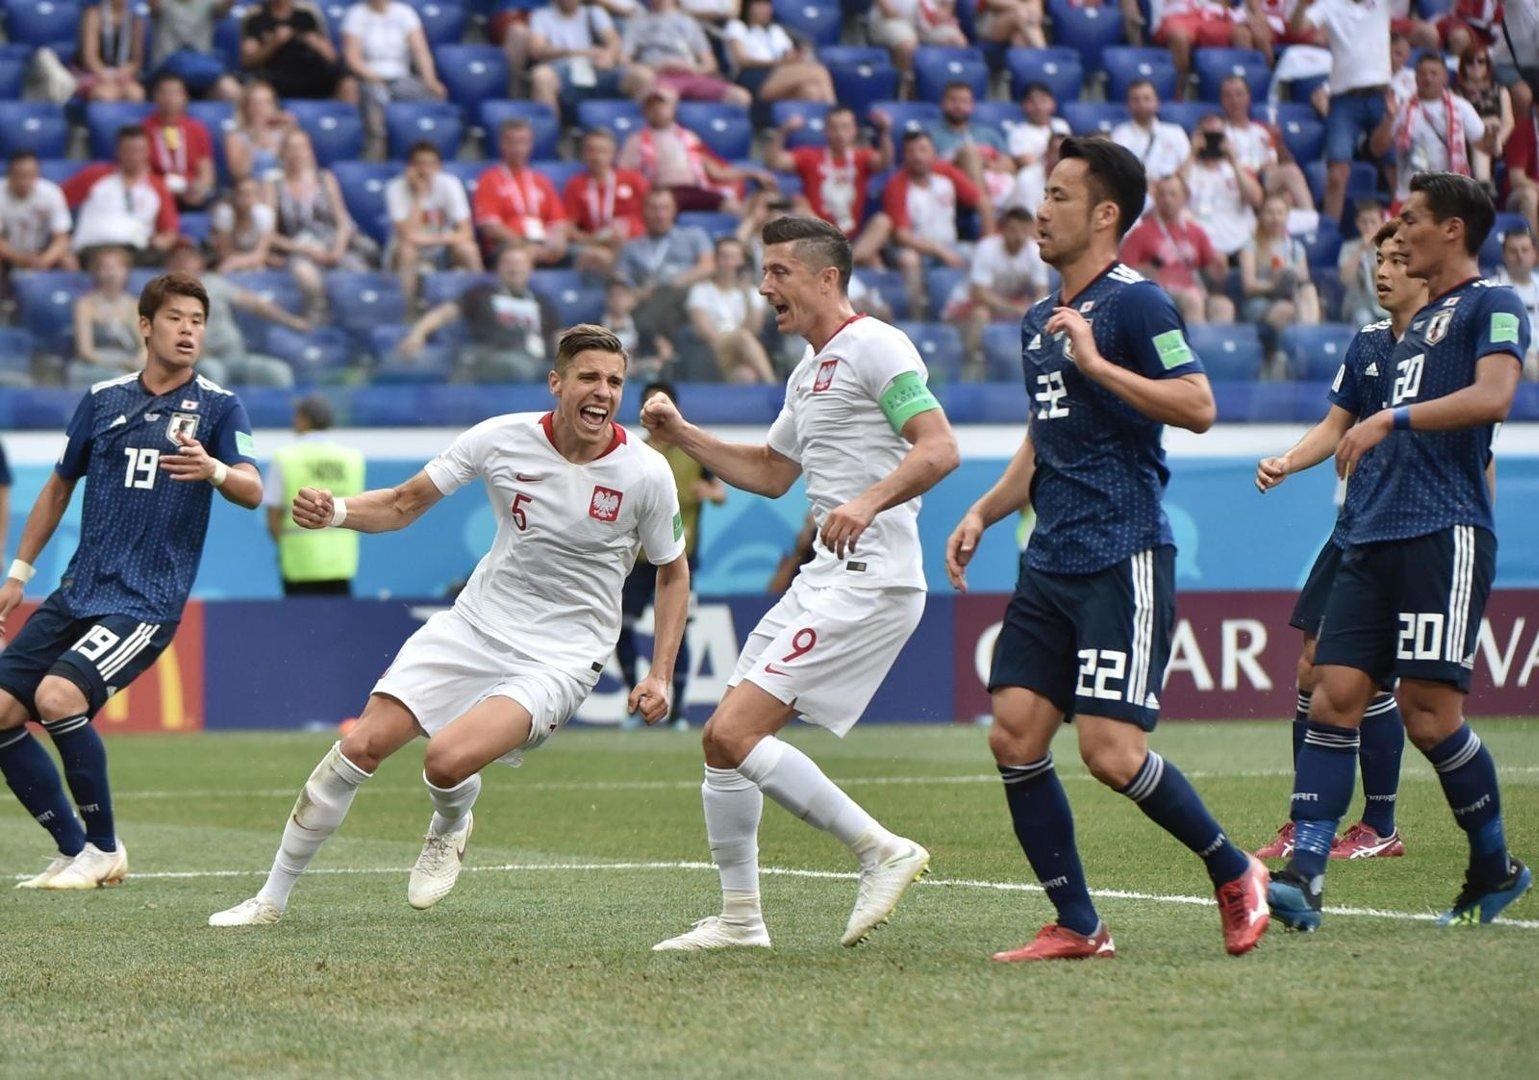 2ef4e7c34 MŚ 2018 Japonia - Polska. Jan Bednarek strzelił gola dla Polski ...